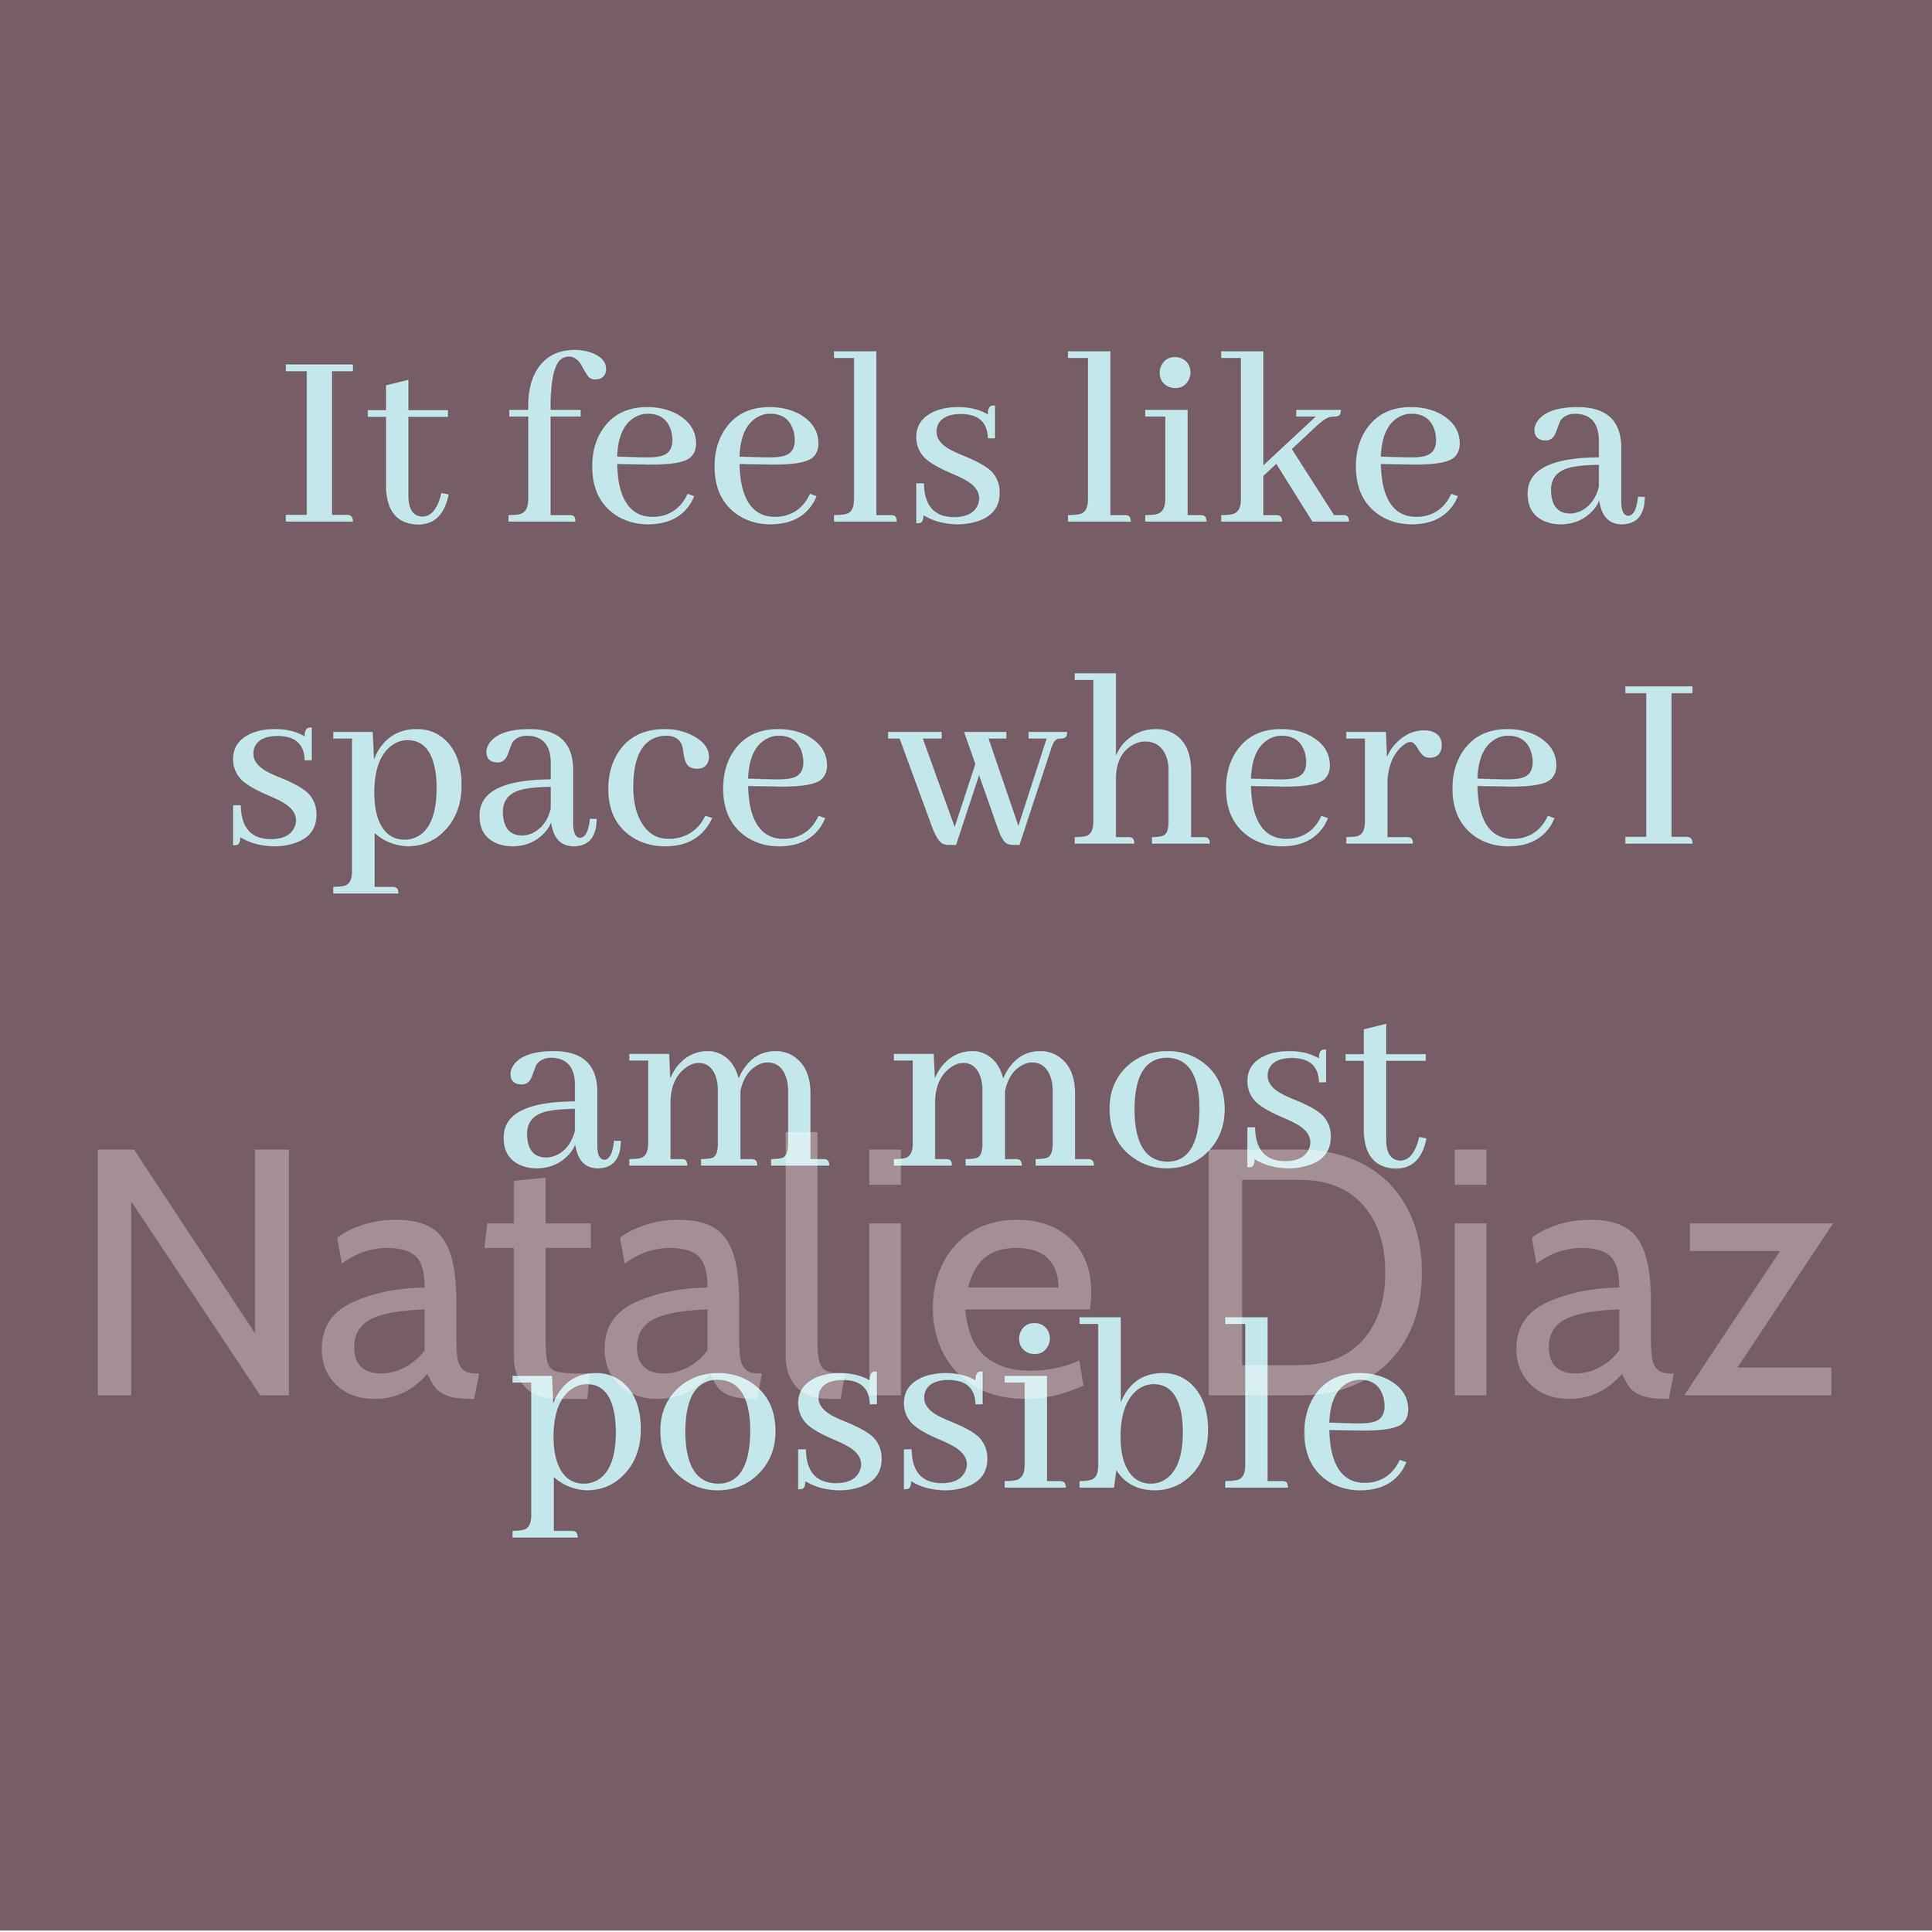 2019.05.29 Natalie Diaz.png